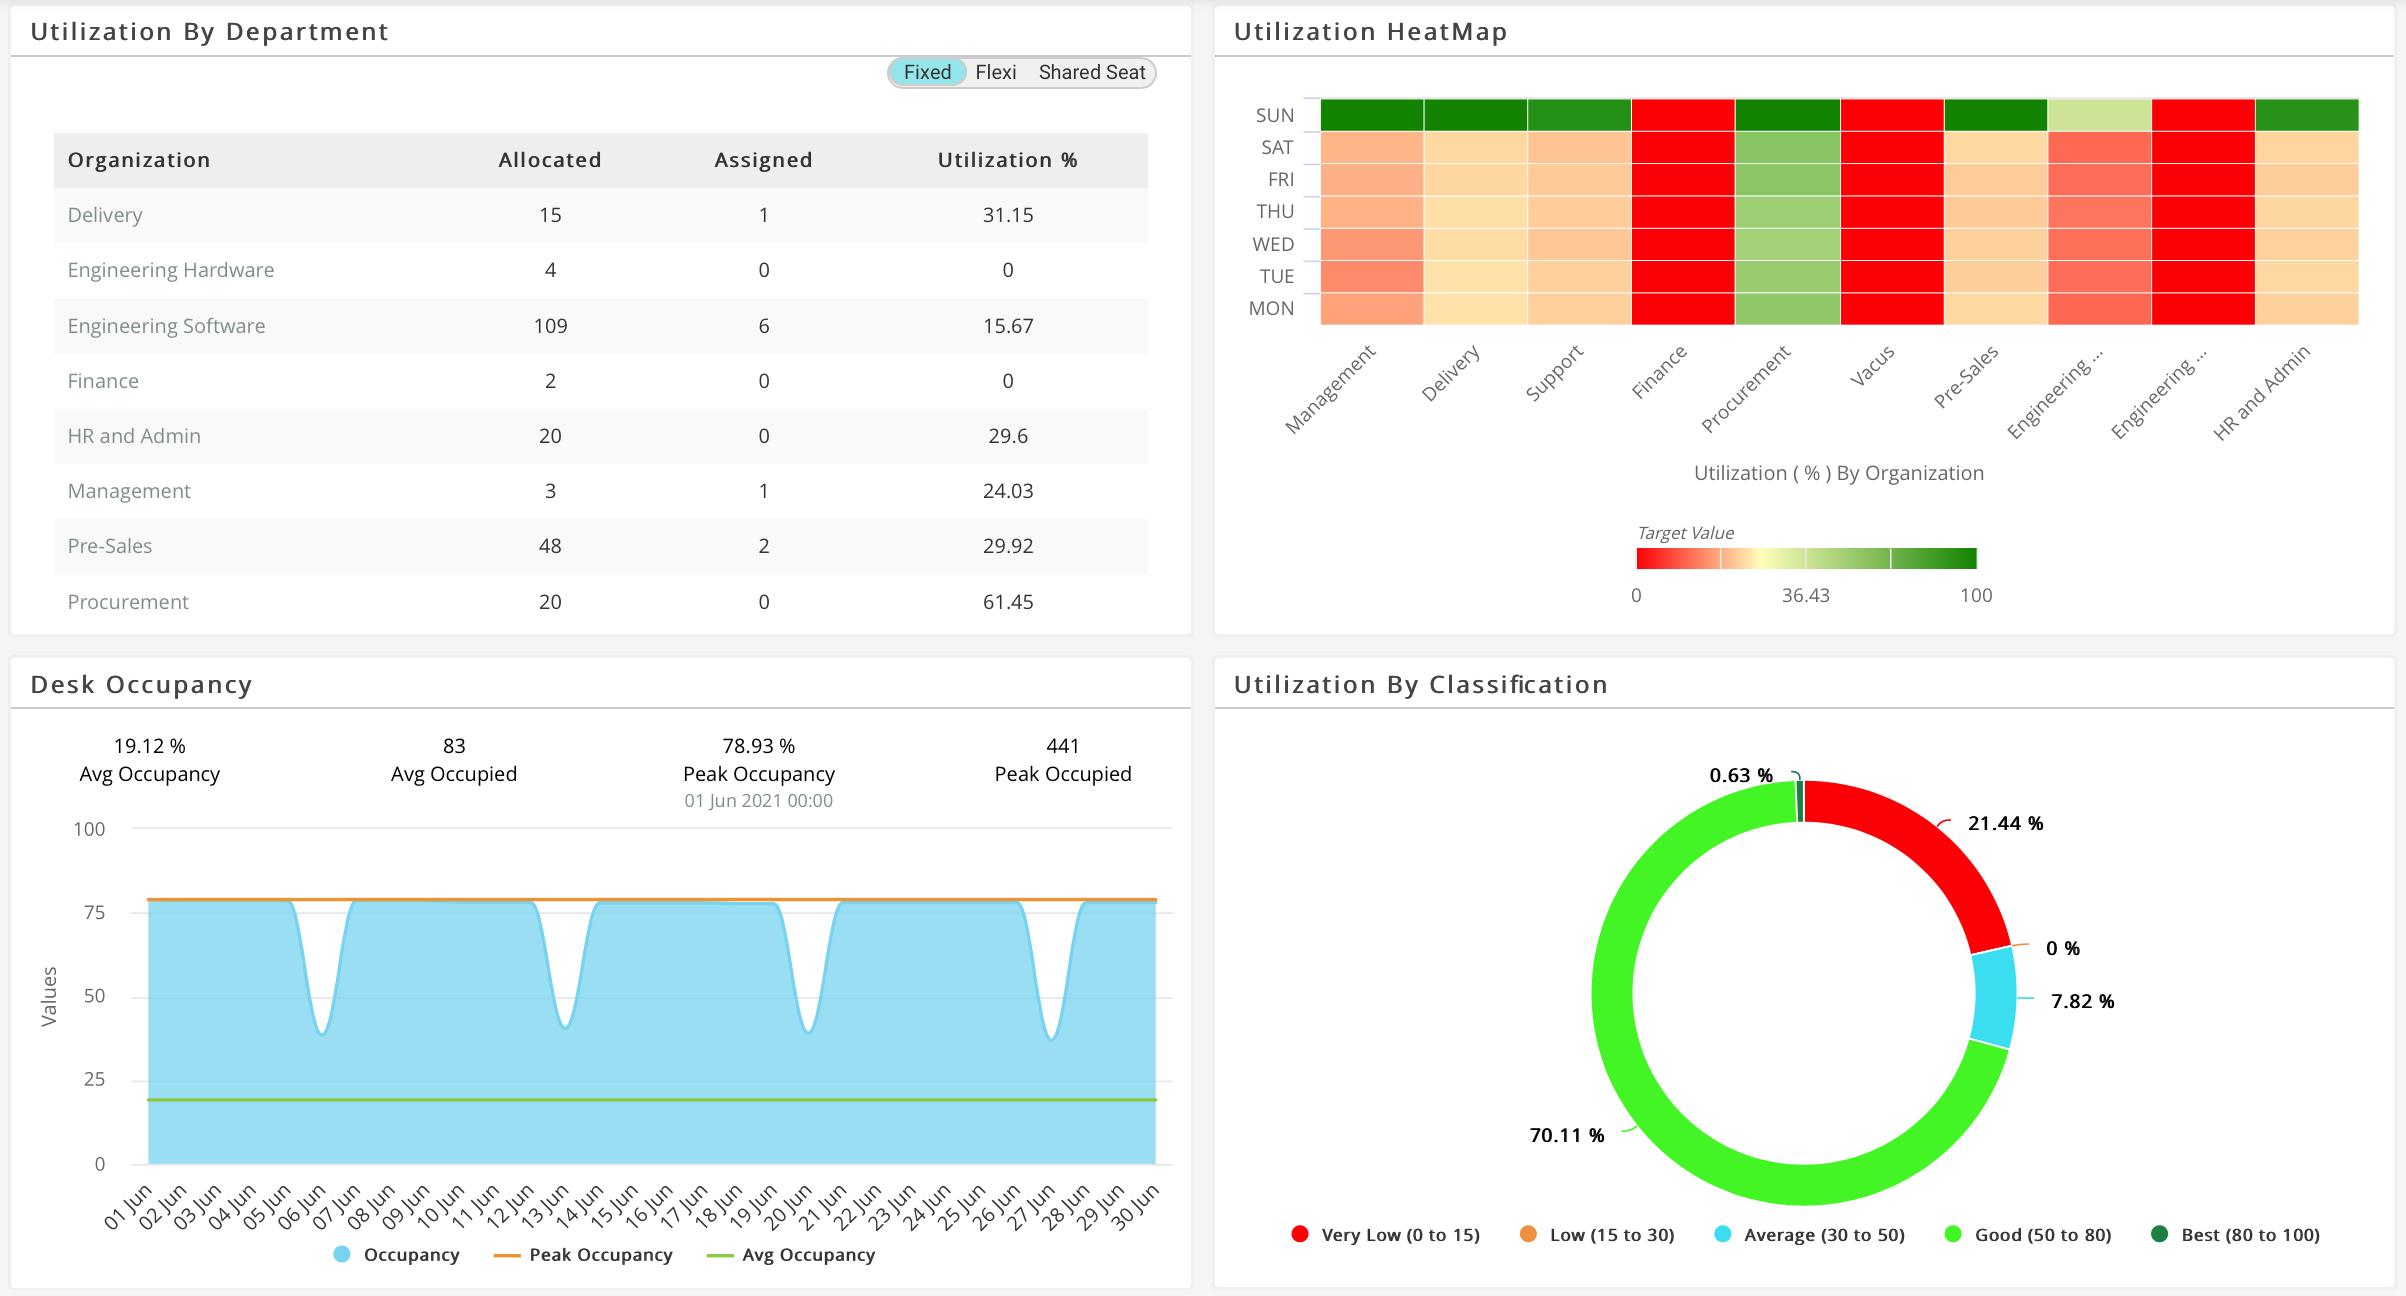 Dashboard & Analytics displaying occupancy & utilisation analytics across departments, peak occupancy, average occupancy & more.